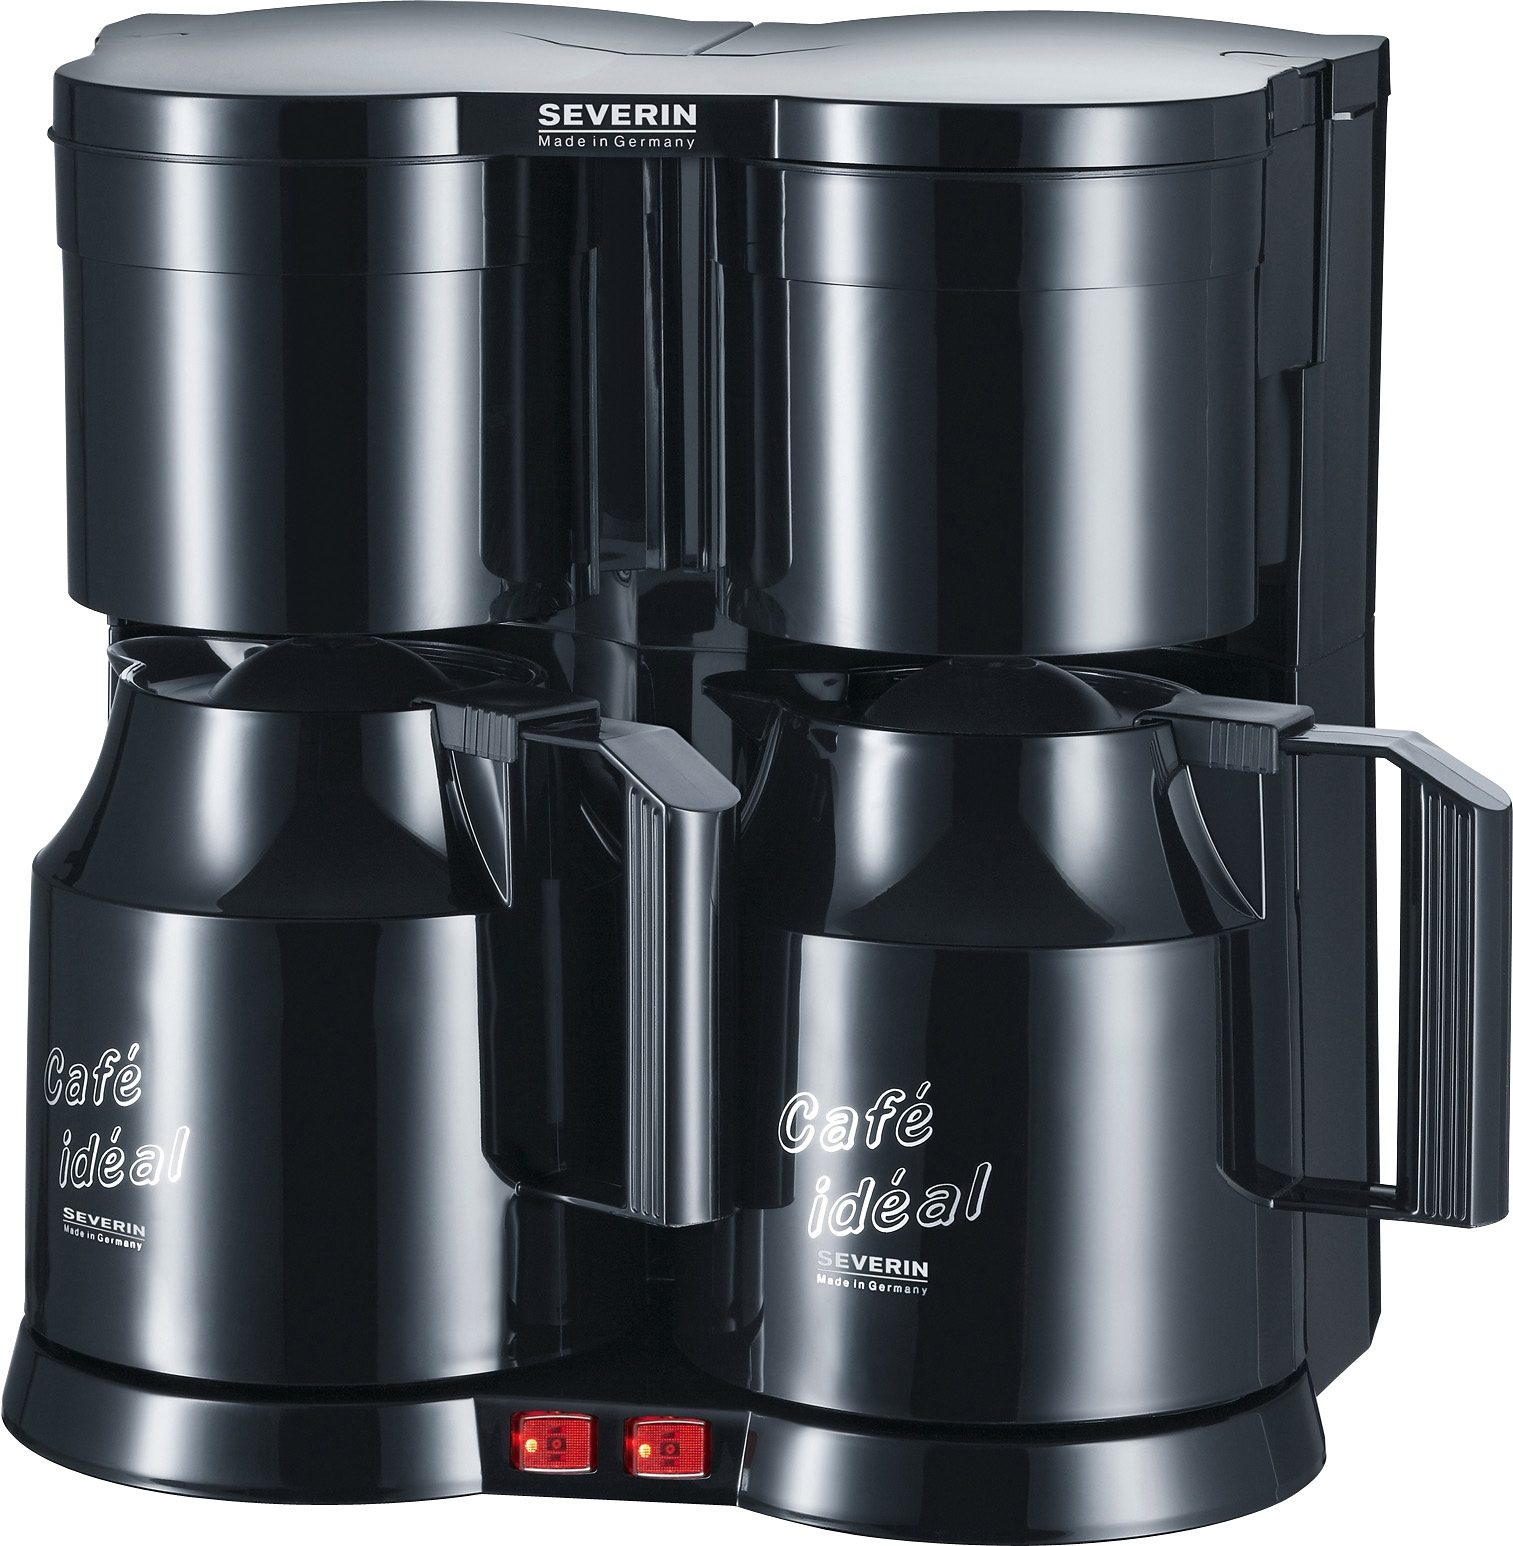 Severin Filterkaffeemaschine Duo-Kaffeeautomat KA 5828, 1,2l Kaffeekanne, Papierfilter 1x4, mit 2 Thermokannen